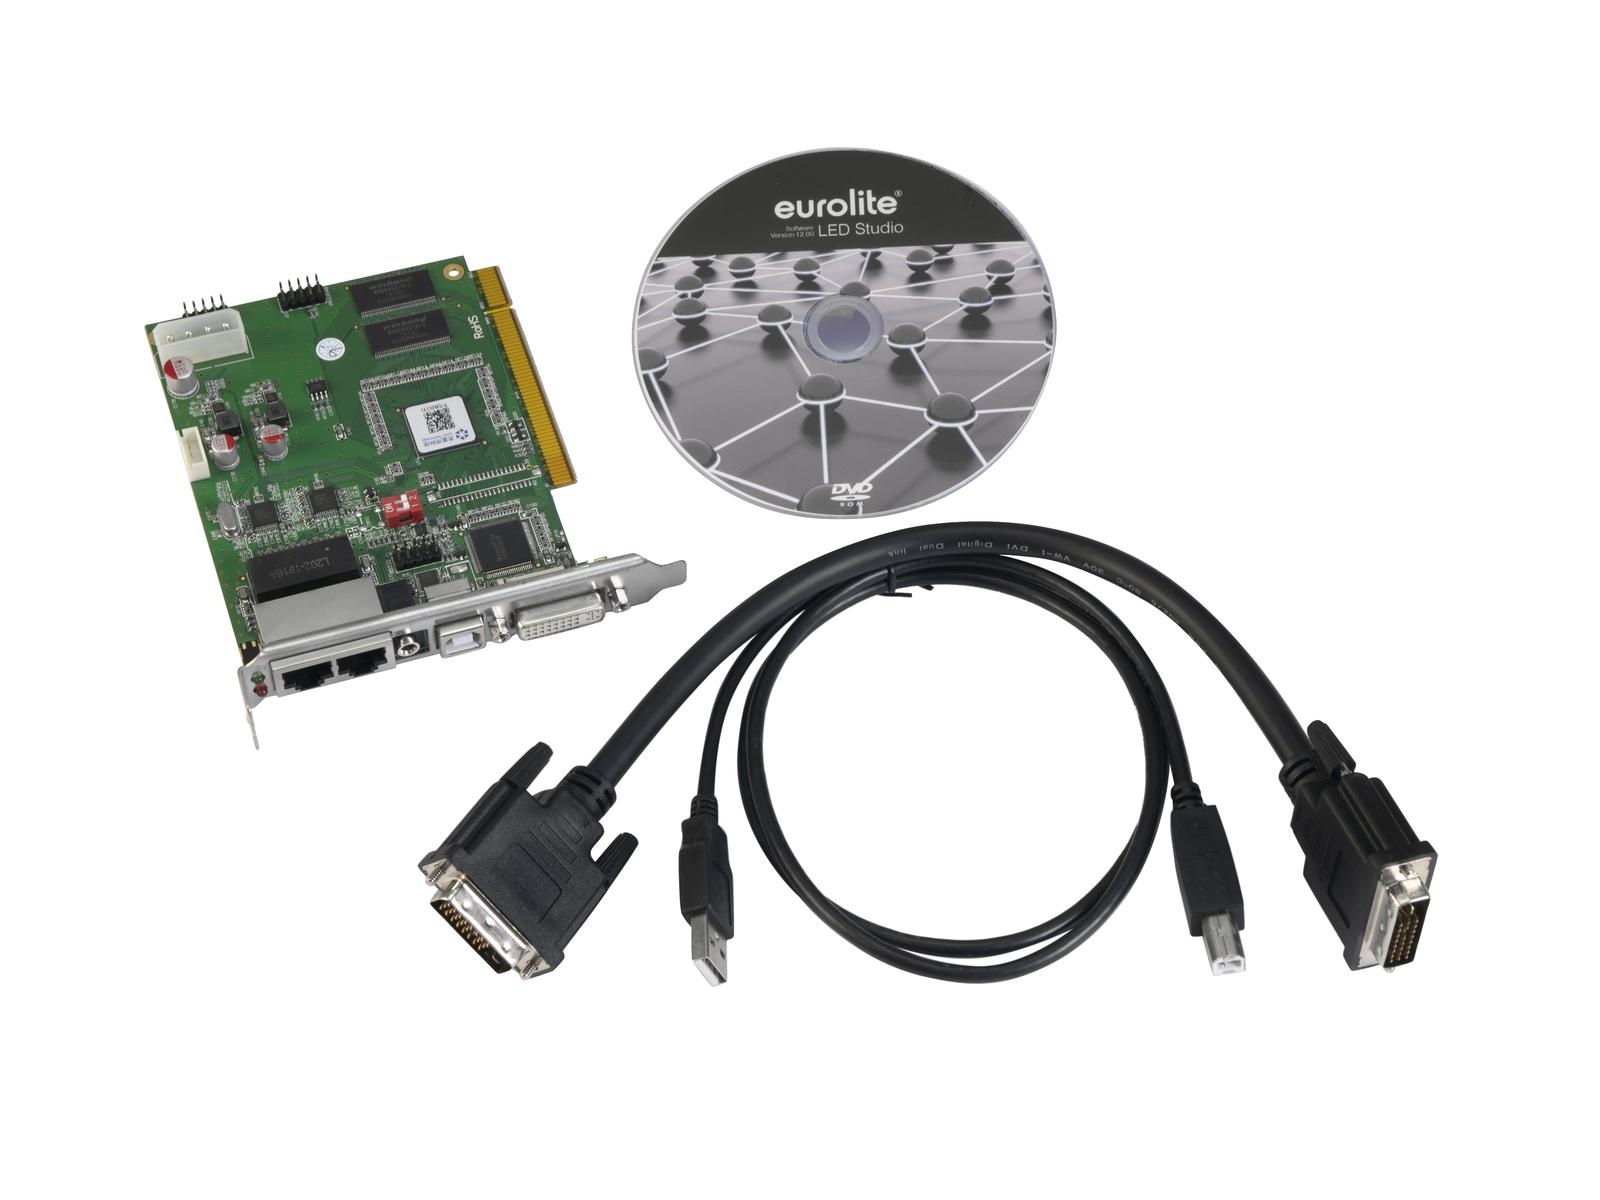 EUROLITE PCI-Senderkarte und Software